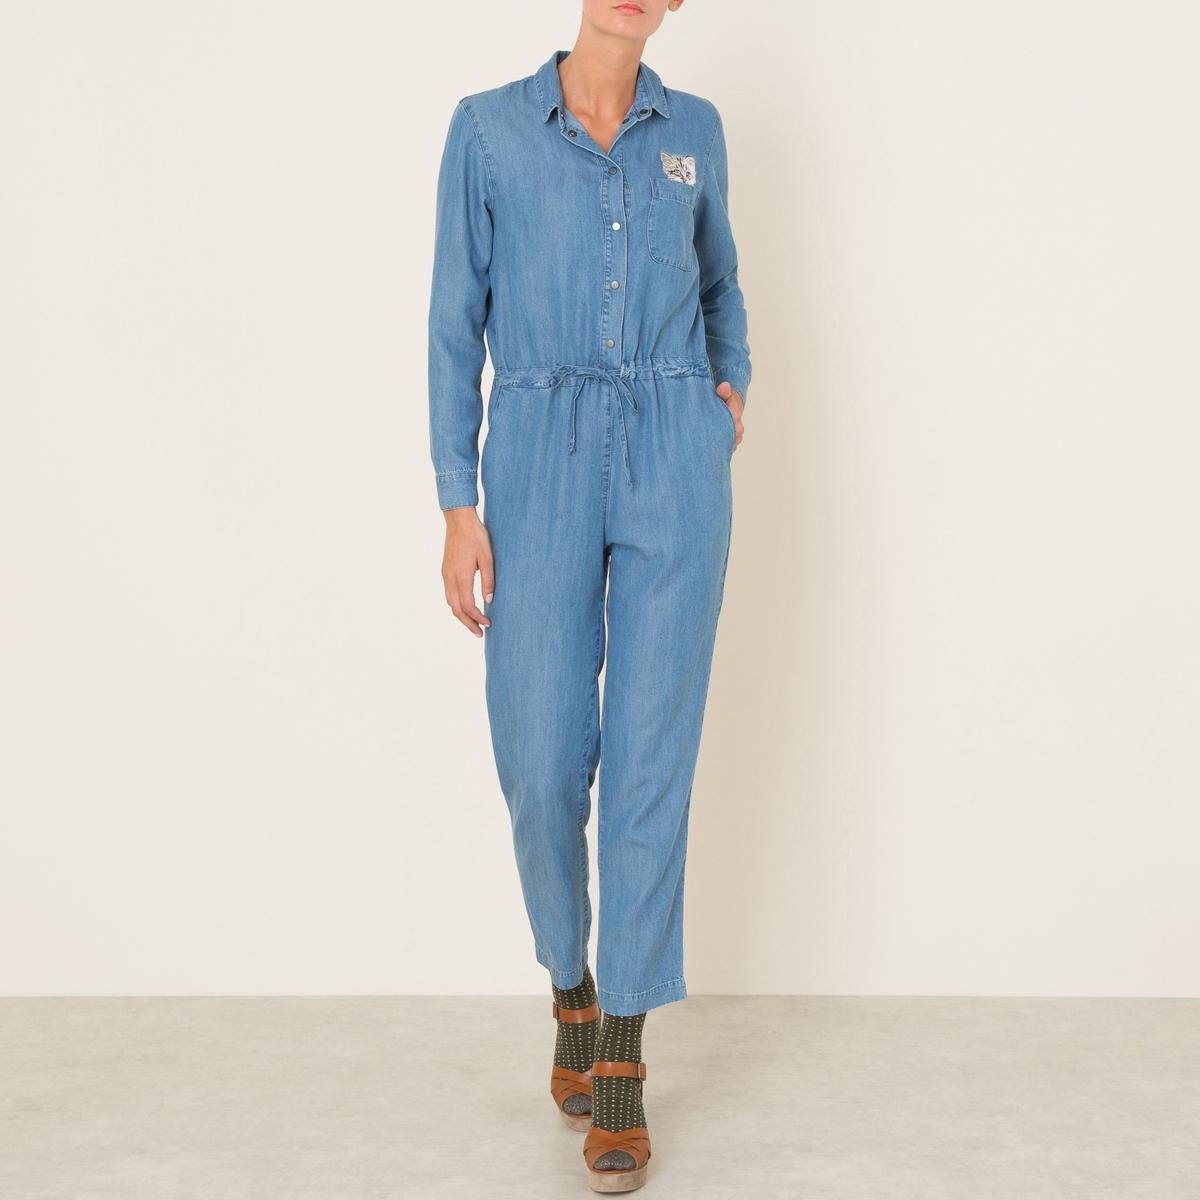 Комбинезон с брюками SONOMA от La Redoute